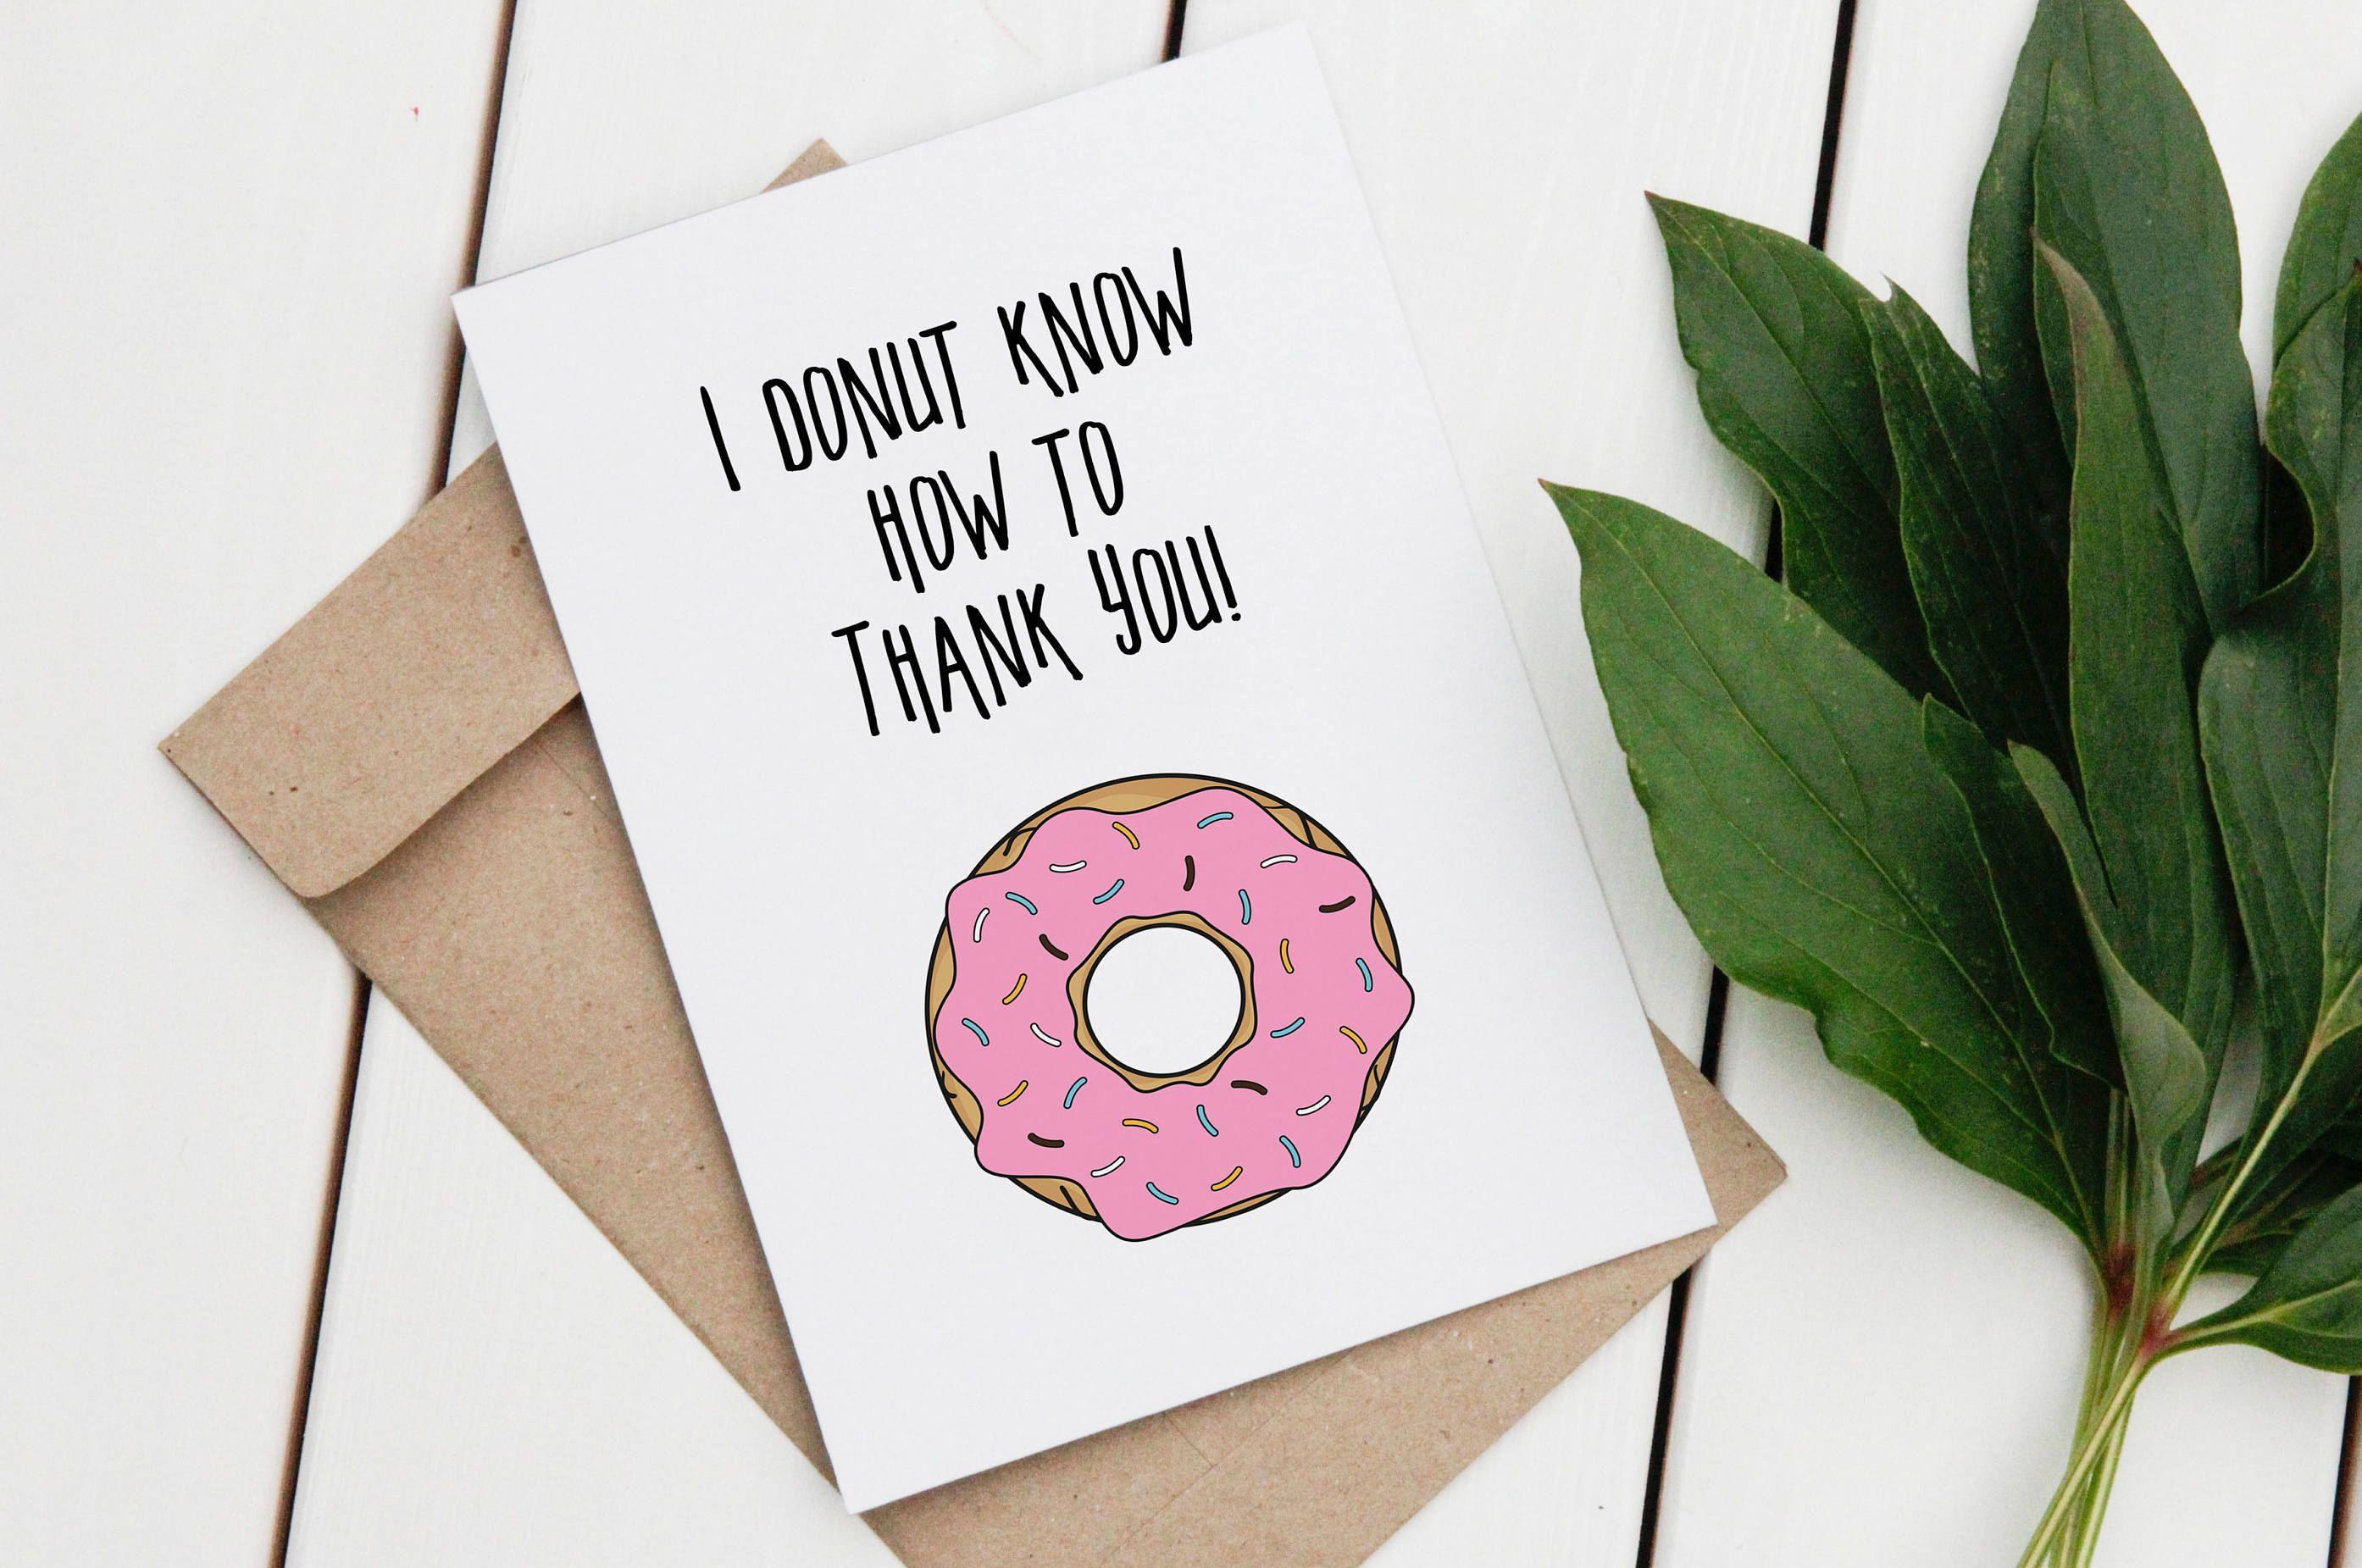 Thank you greeting card thankyou card donut card donut greeting thank you greeting card thankyou card donut card donut greeting card printable kristyandbryce Choice Image